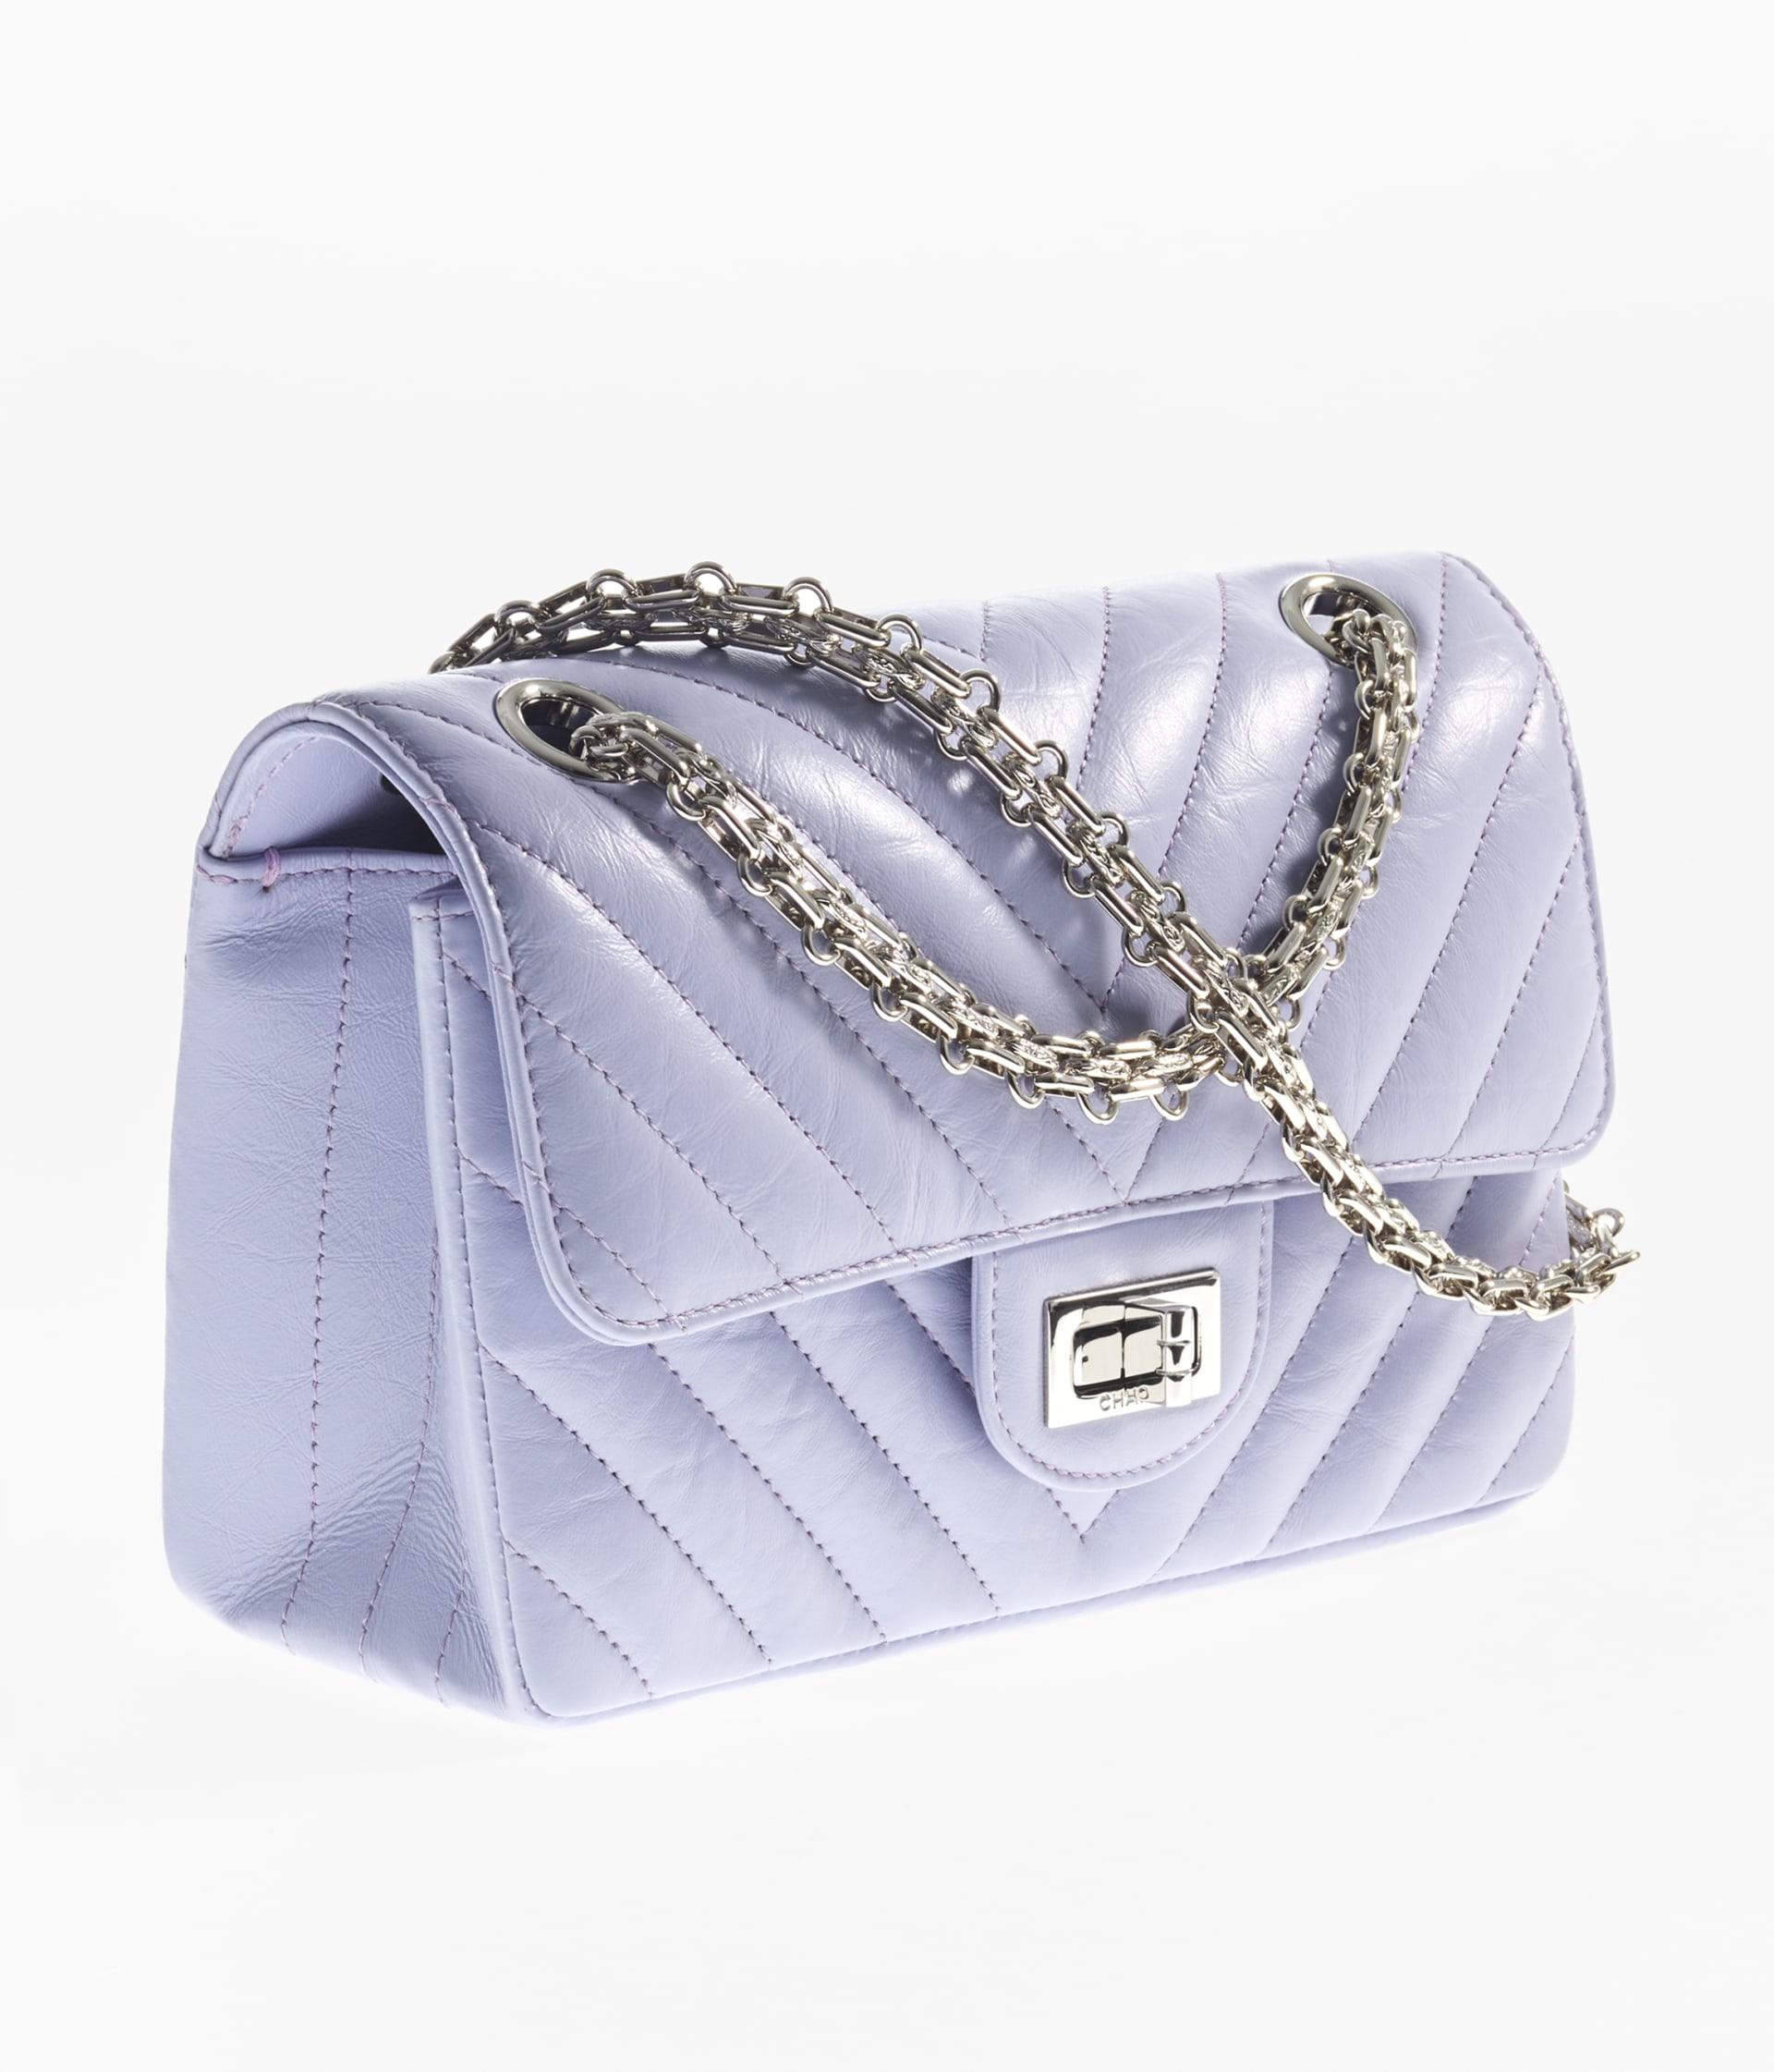 image 2 - Mini 2.55 Handbag - Aged Calfskin & Silver-Tone Metal - Light Purple